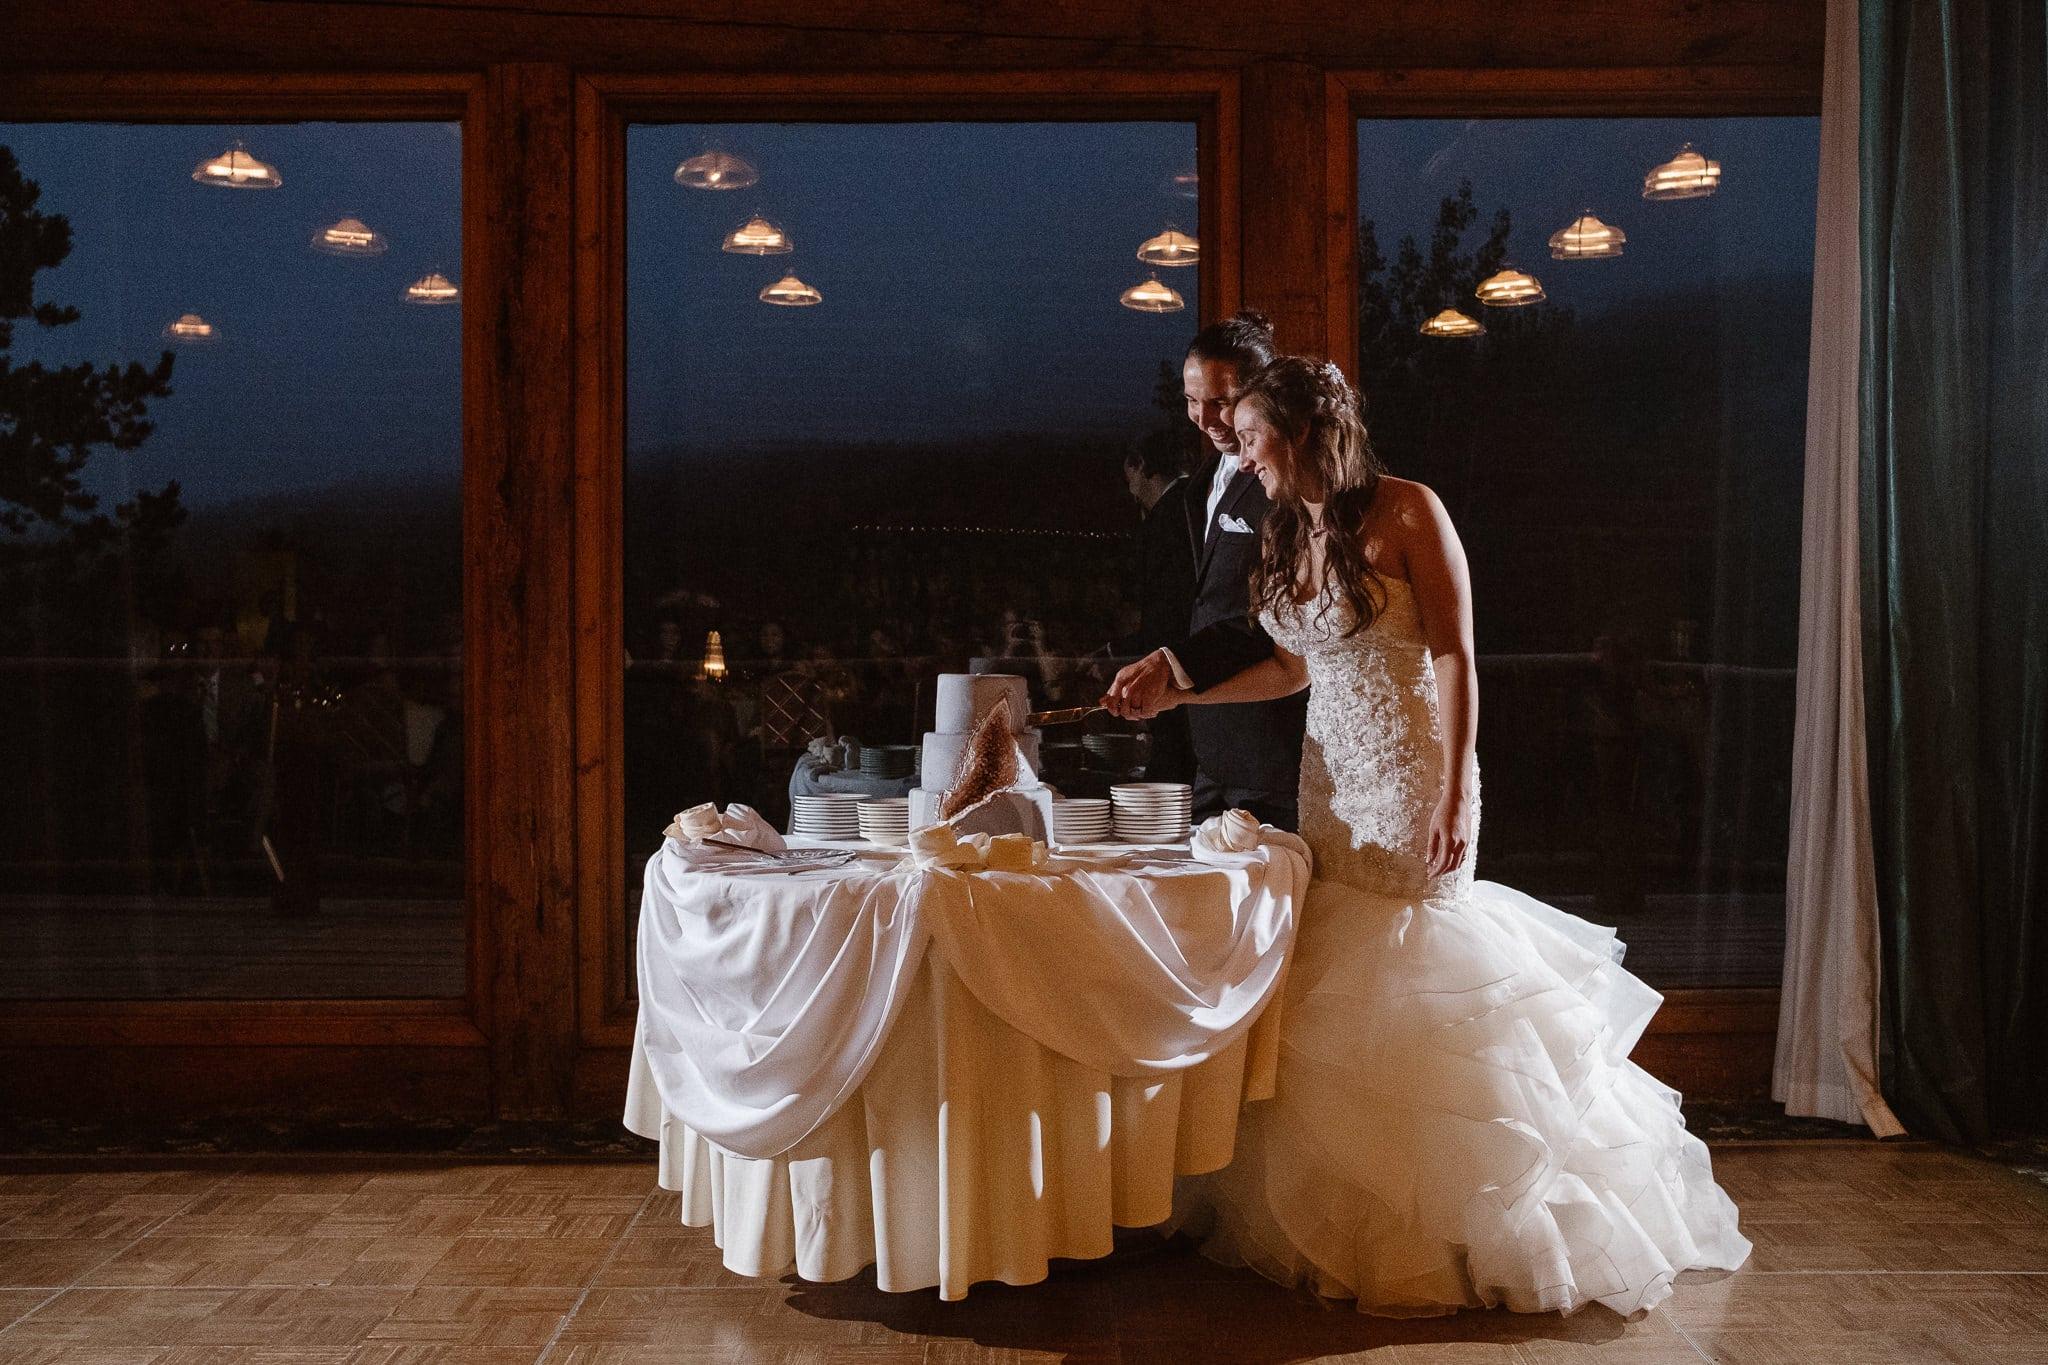 Dao House wedding photographer, Estes Park wedding venue, Colorado mountain wedding, bride and groom cutting cake, cake cutting,